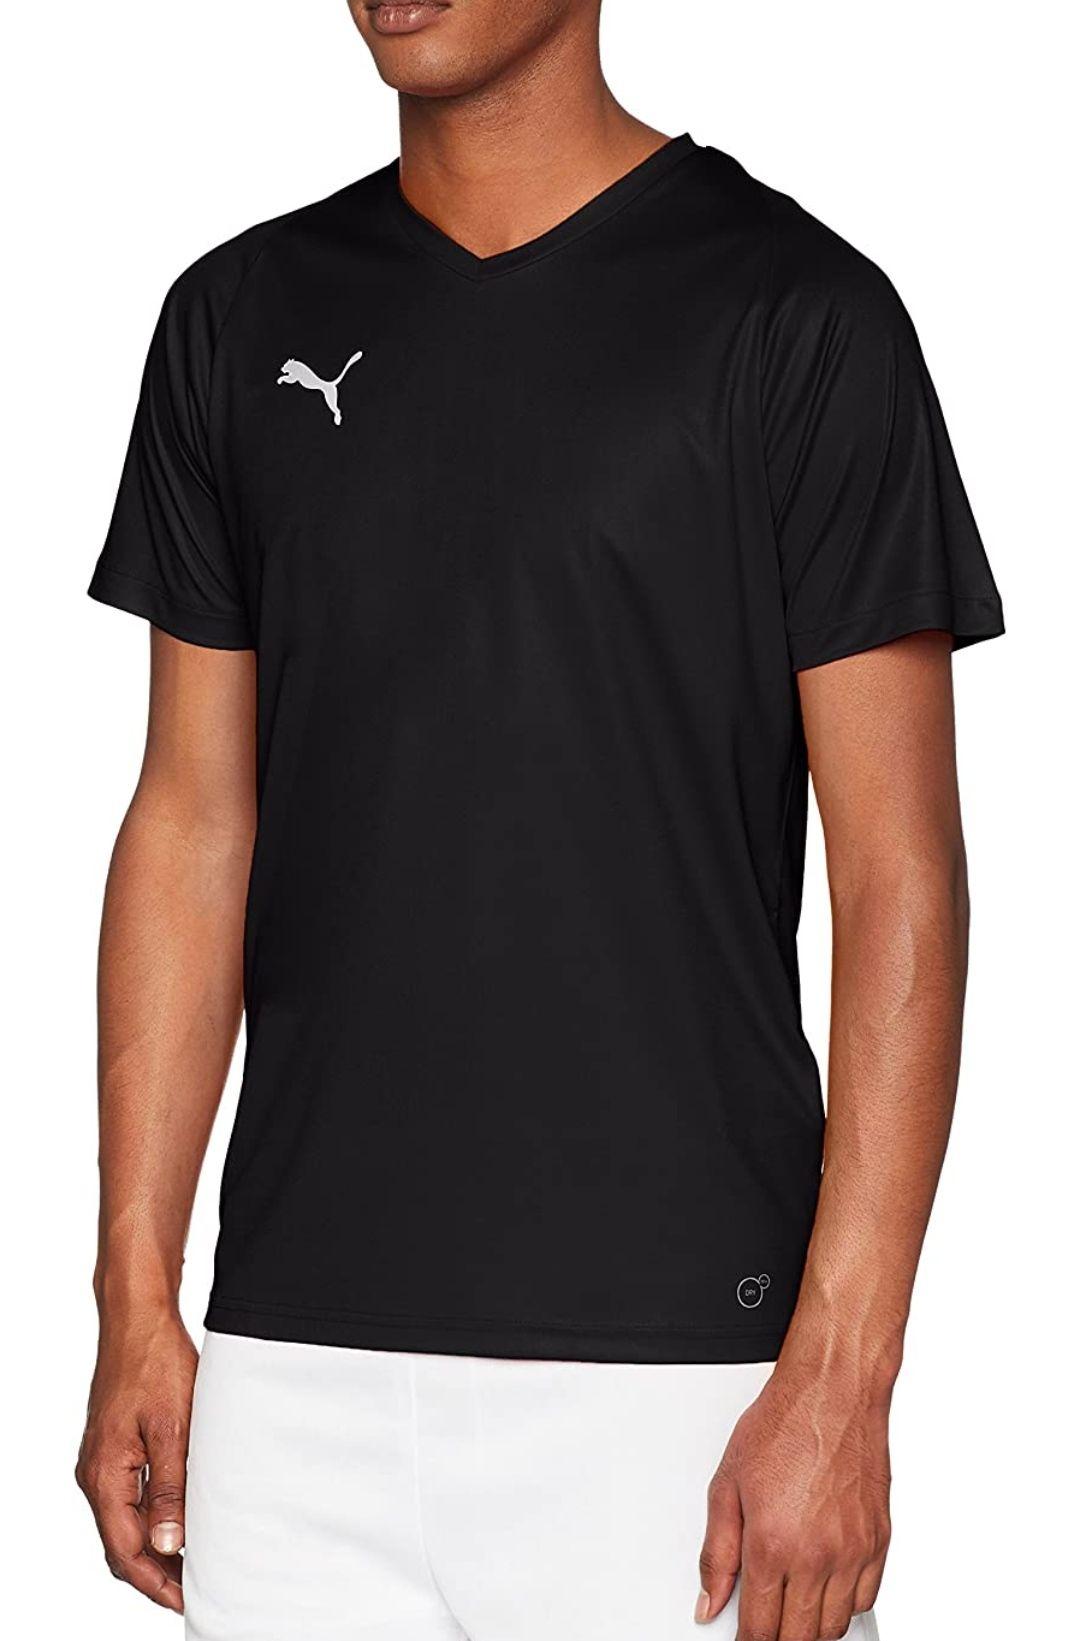 Camiseta Puma. Tallas S a XXL